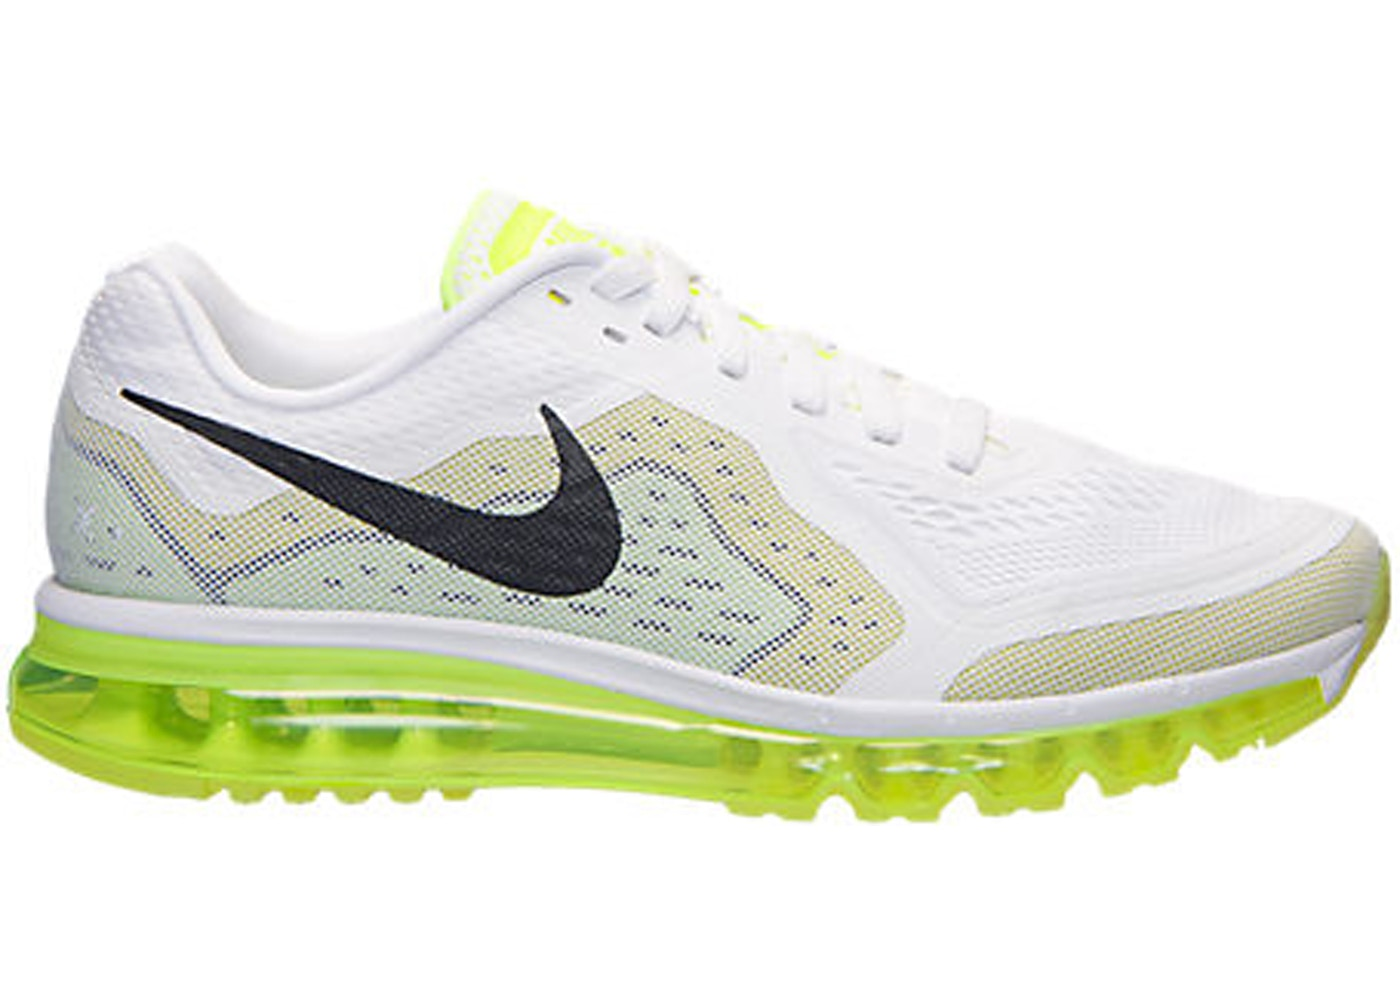 Asimilar capacidad Noble  Nike Air Max 2014 White Black Venom Green - 621077-103